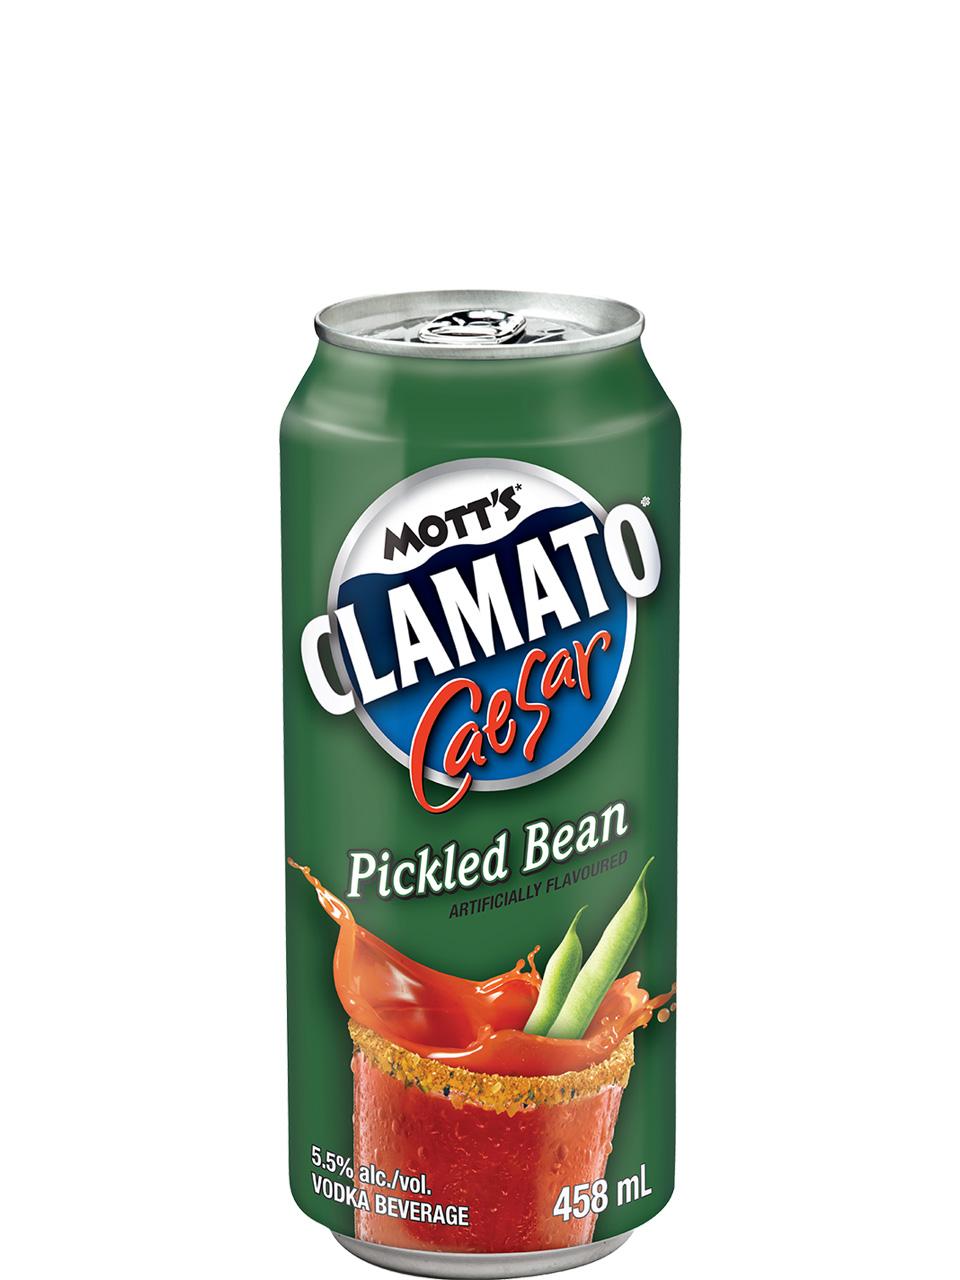 Mott's Clamato Caesar Pickled Bean 458ml Can